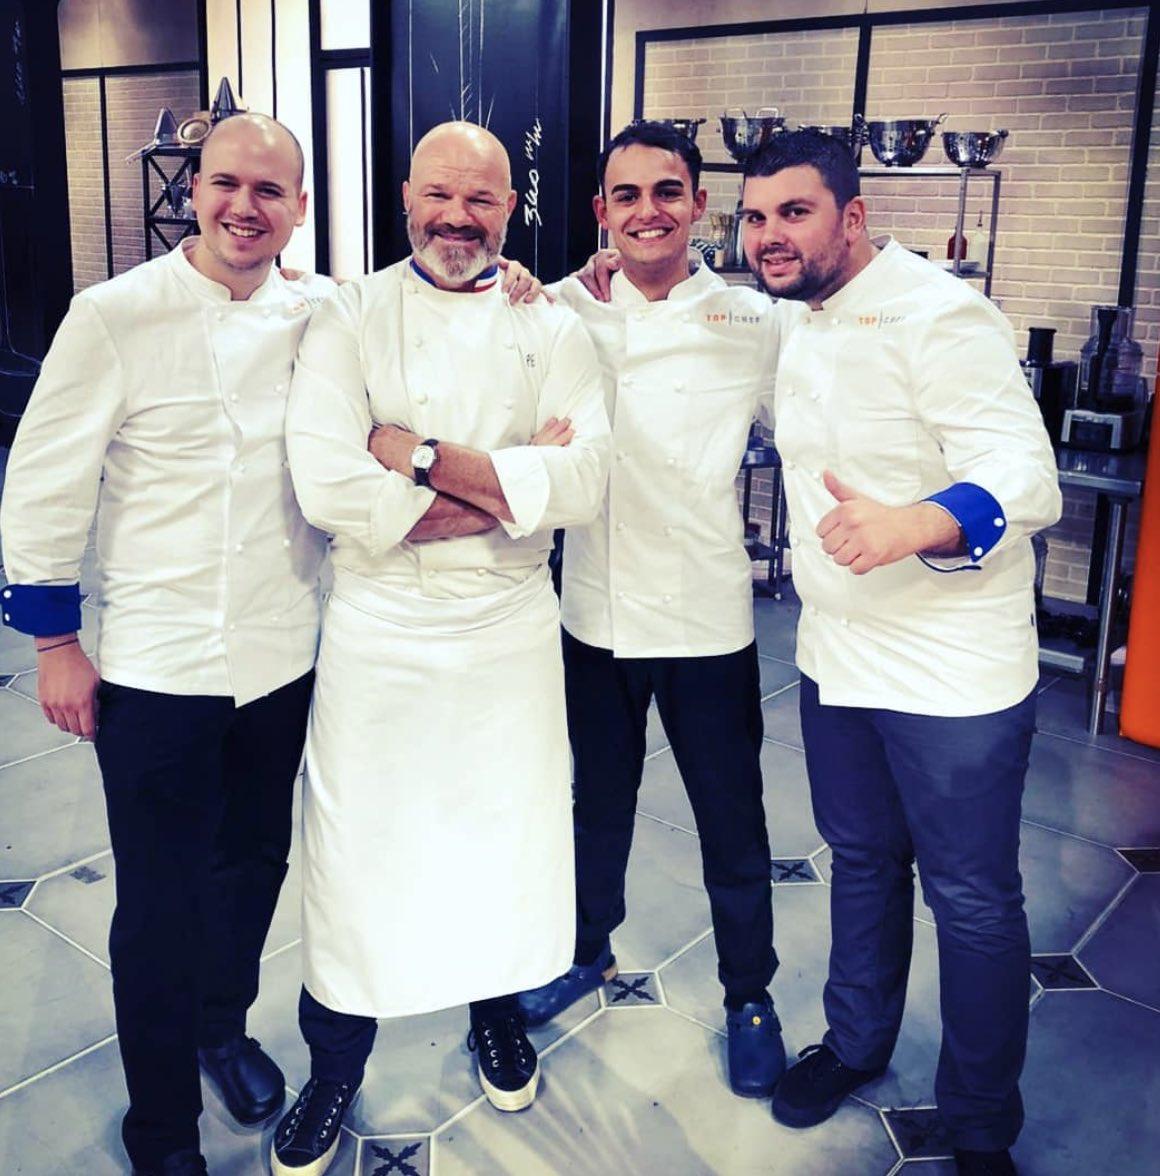 Top Chef 11 - Top Chef - Philippe Etchebest - brigade bleue - brigade